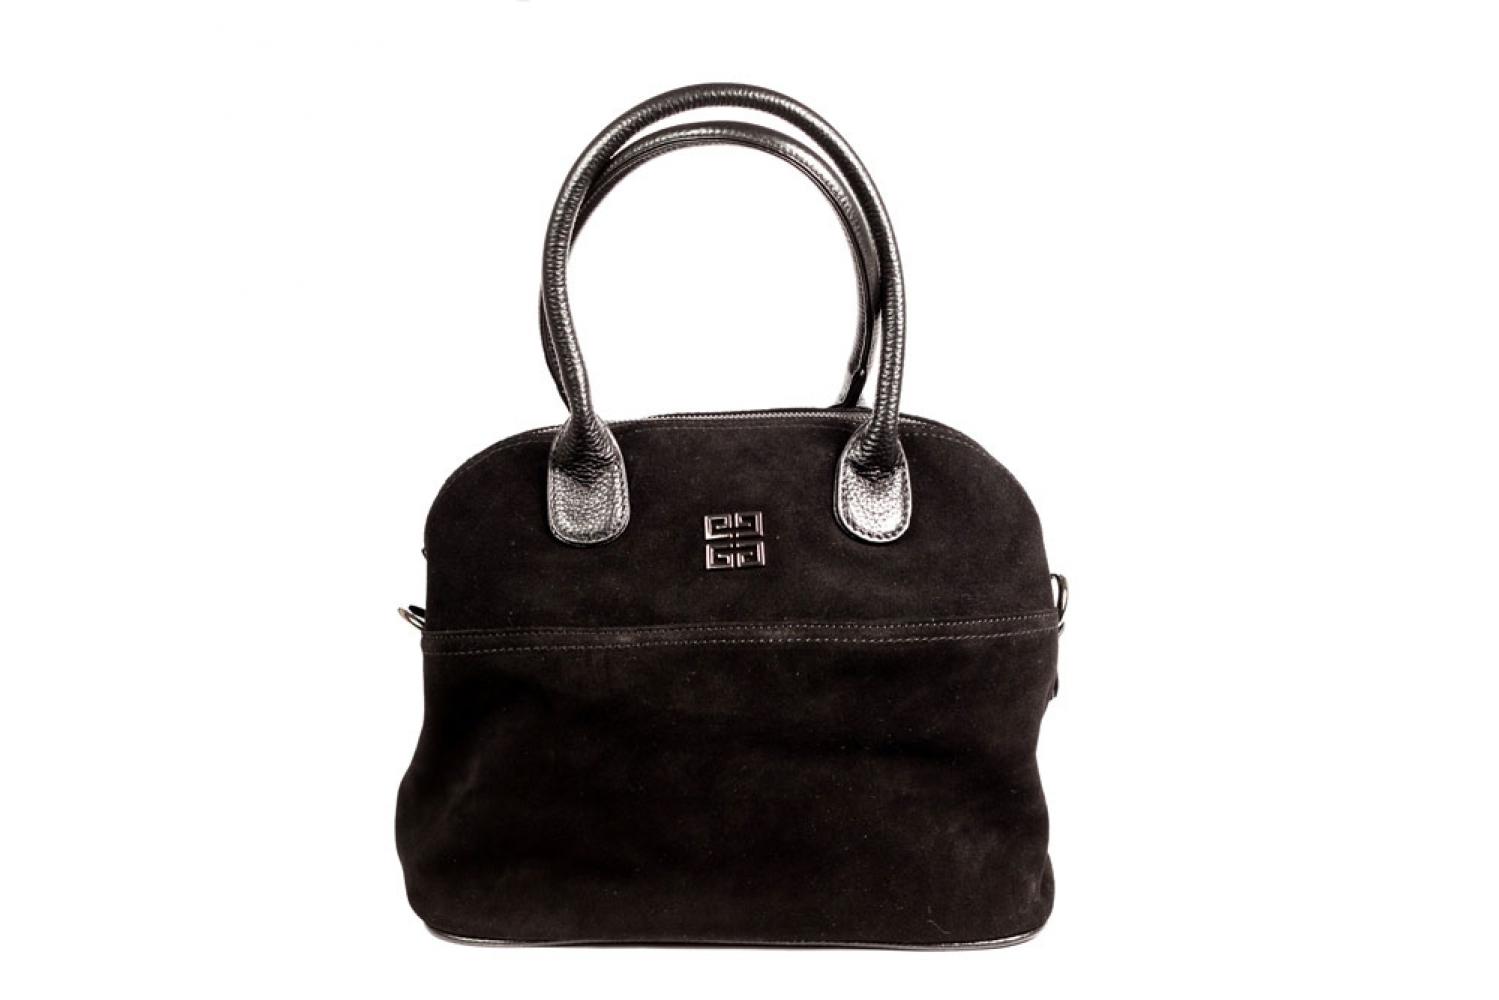 Confidentialtransiwodex — Giorgio ferilli замшевые сумки a693c0130d503